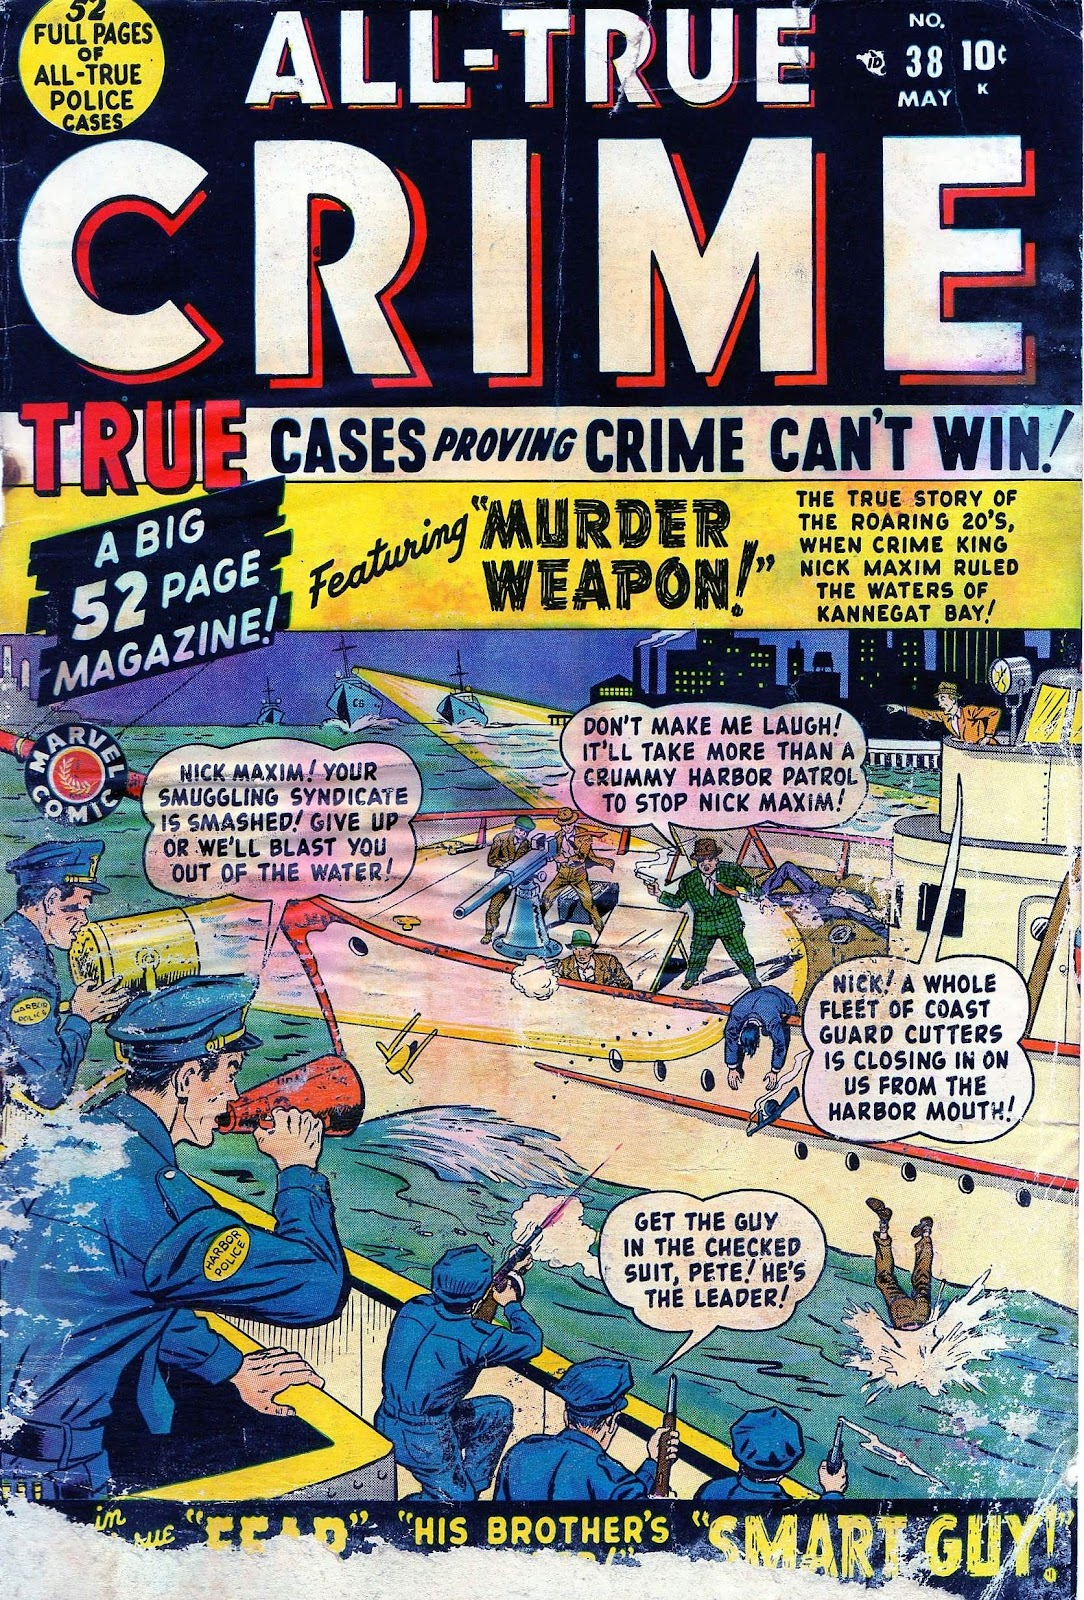 All-True Crime 38 Page 1